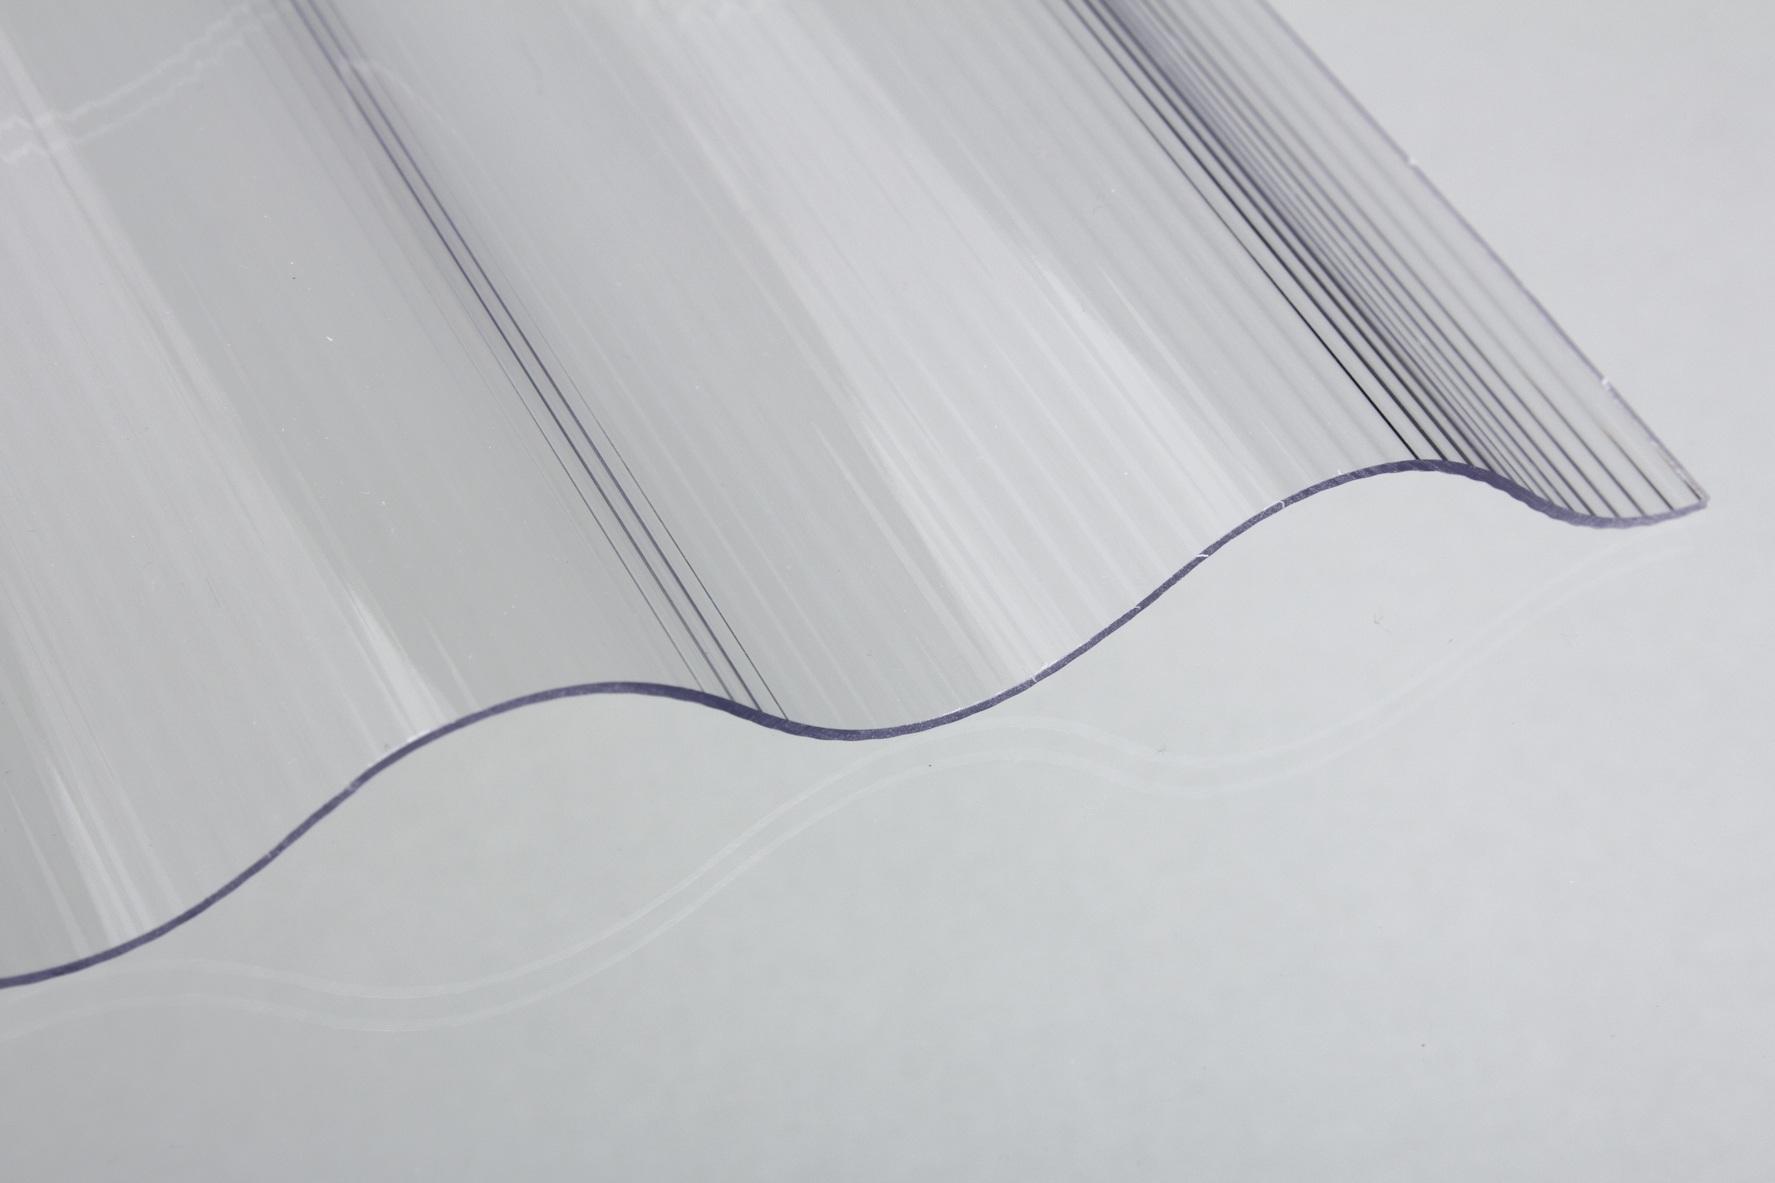 wellplatten lichtplatten polycarbonat 1 4mm no drop dachplatten24. Black Bedroom Furniture Sets. Home Design Ideas